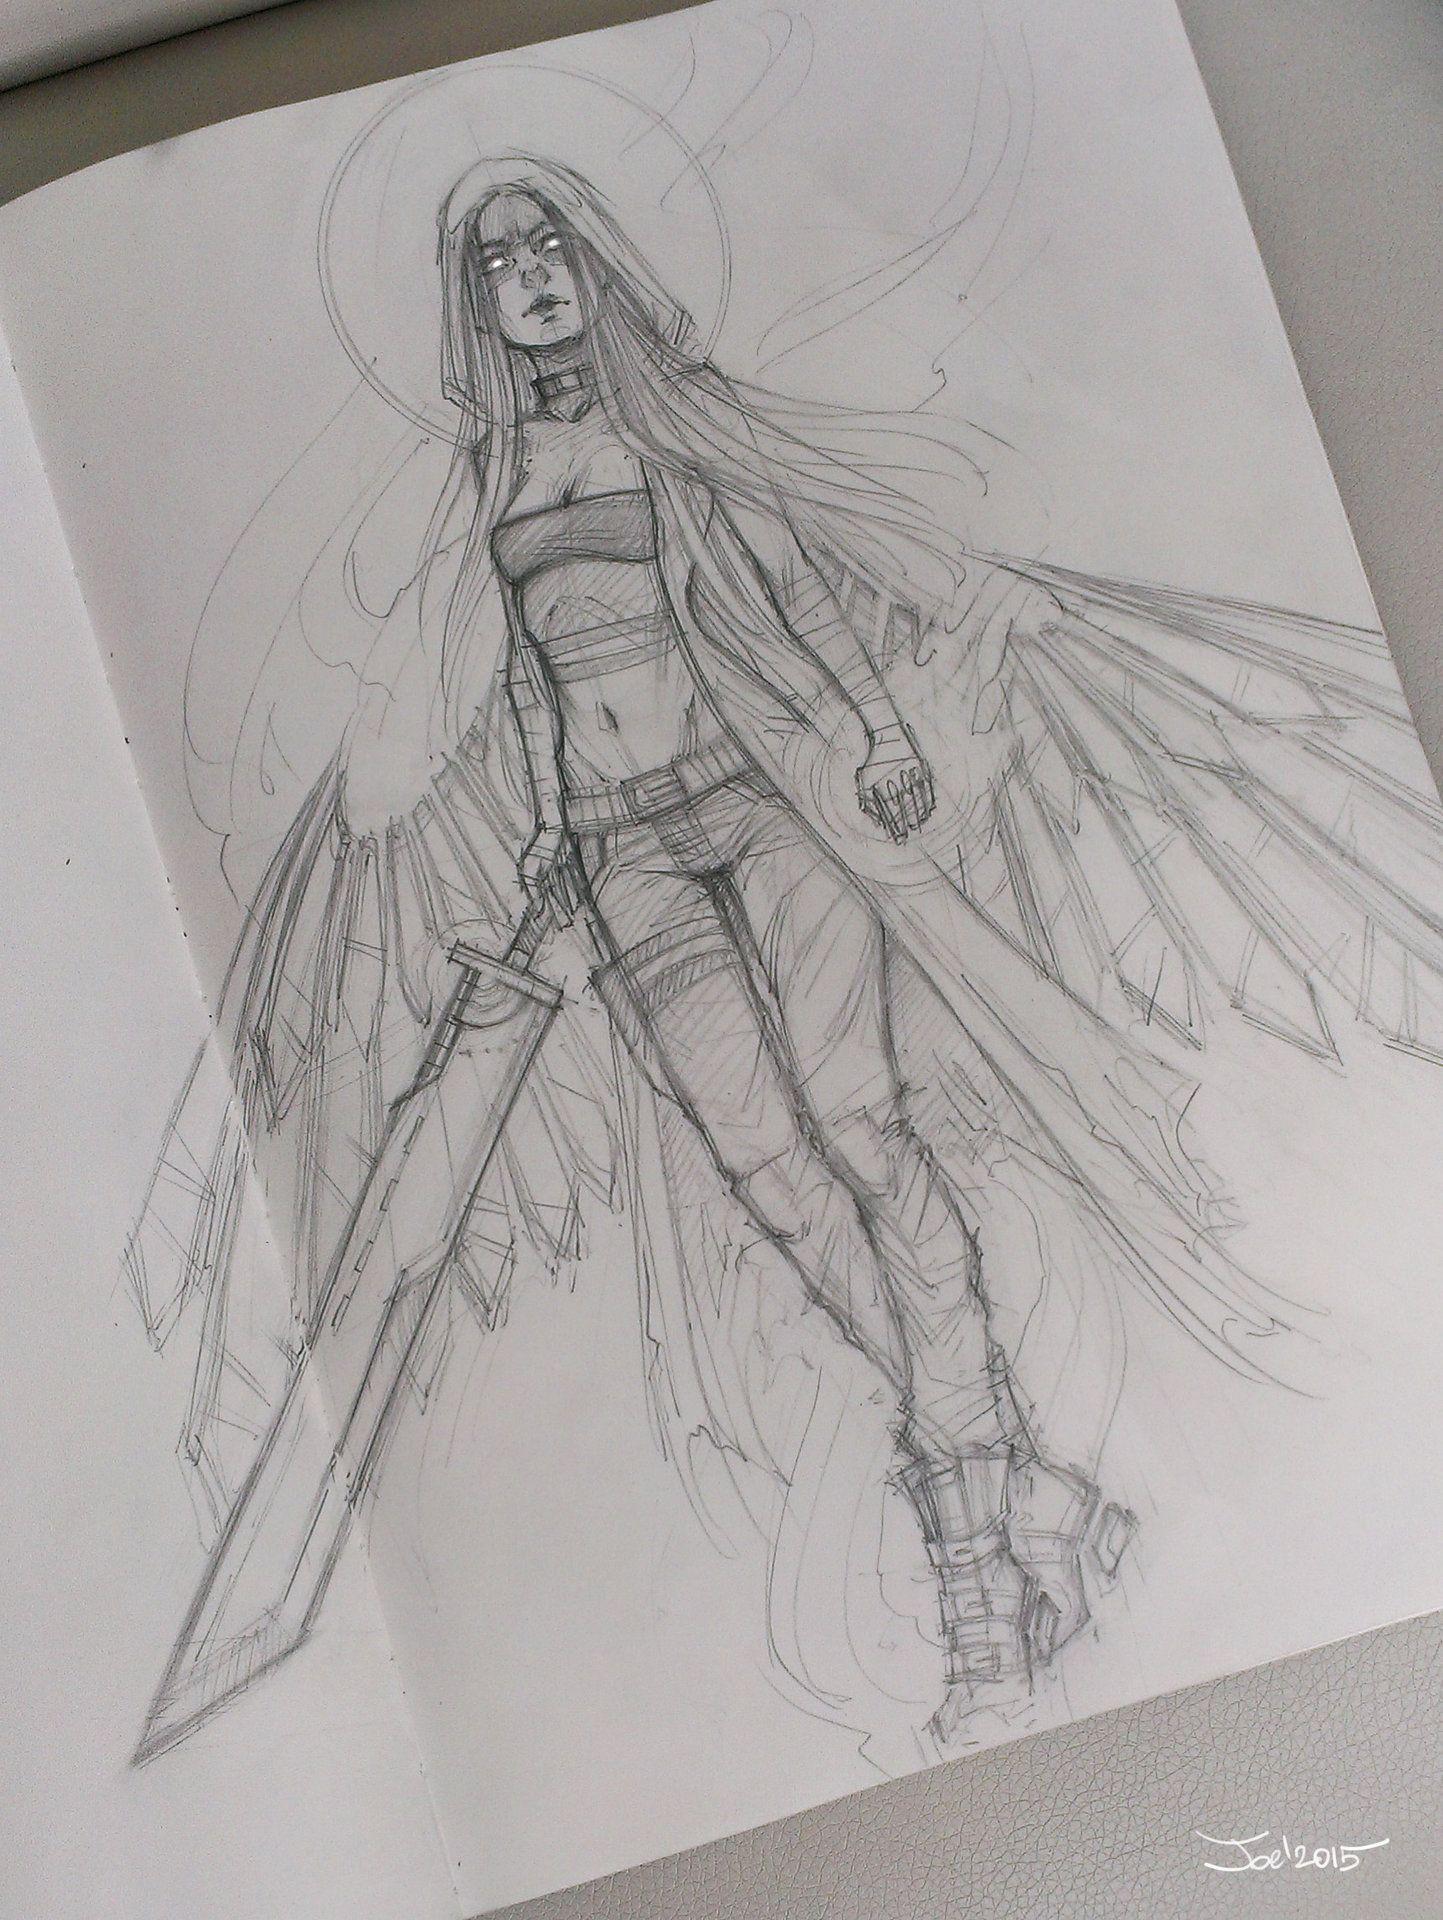 https://artstation.com/artwork/angel-sketch